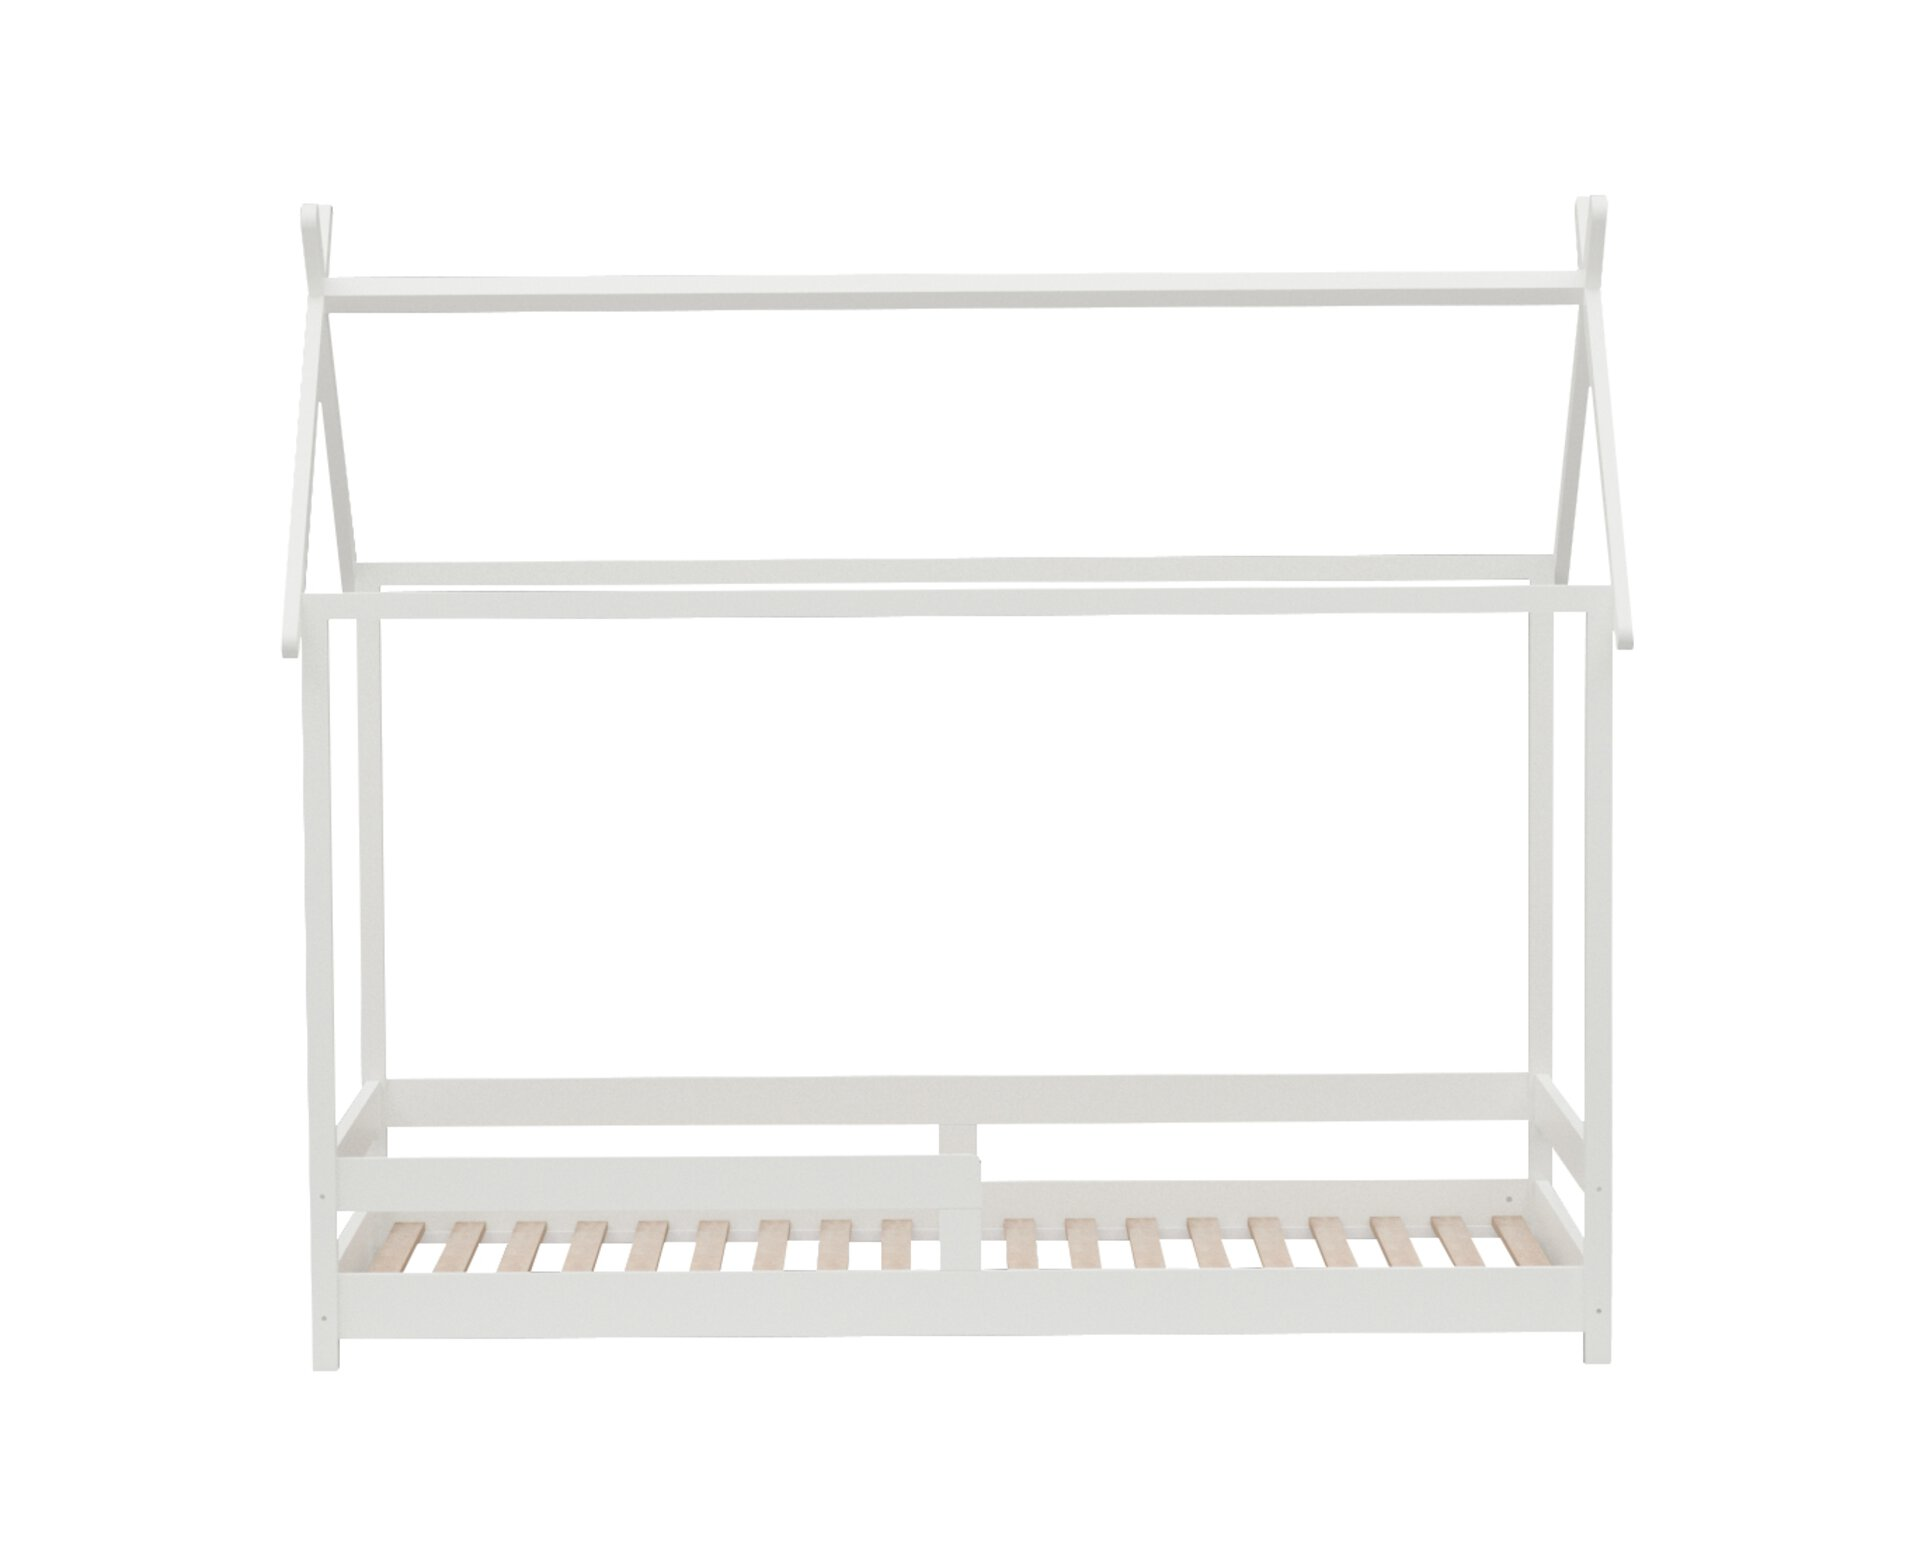 Kinderbett BIOUVAC inbuy Holzwerkstoff weiß 96 x 179 x 210 cm